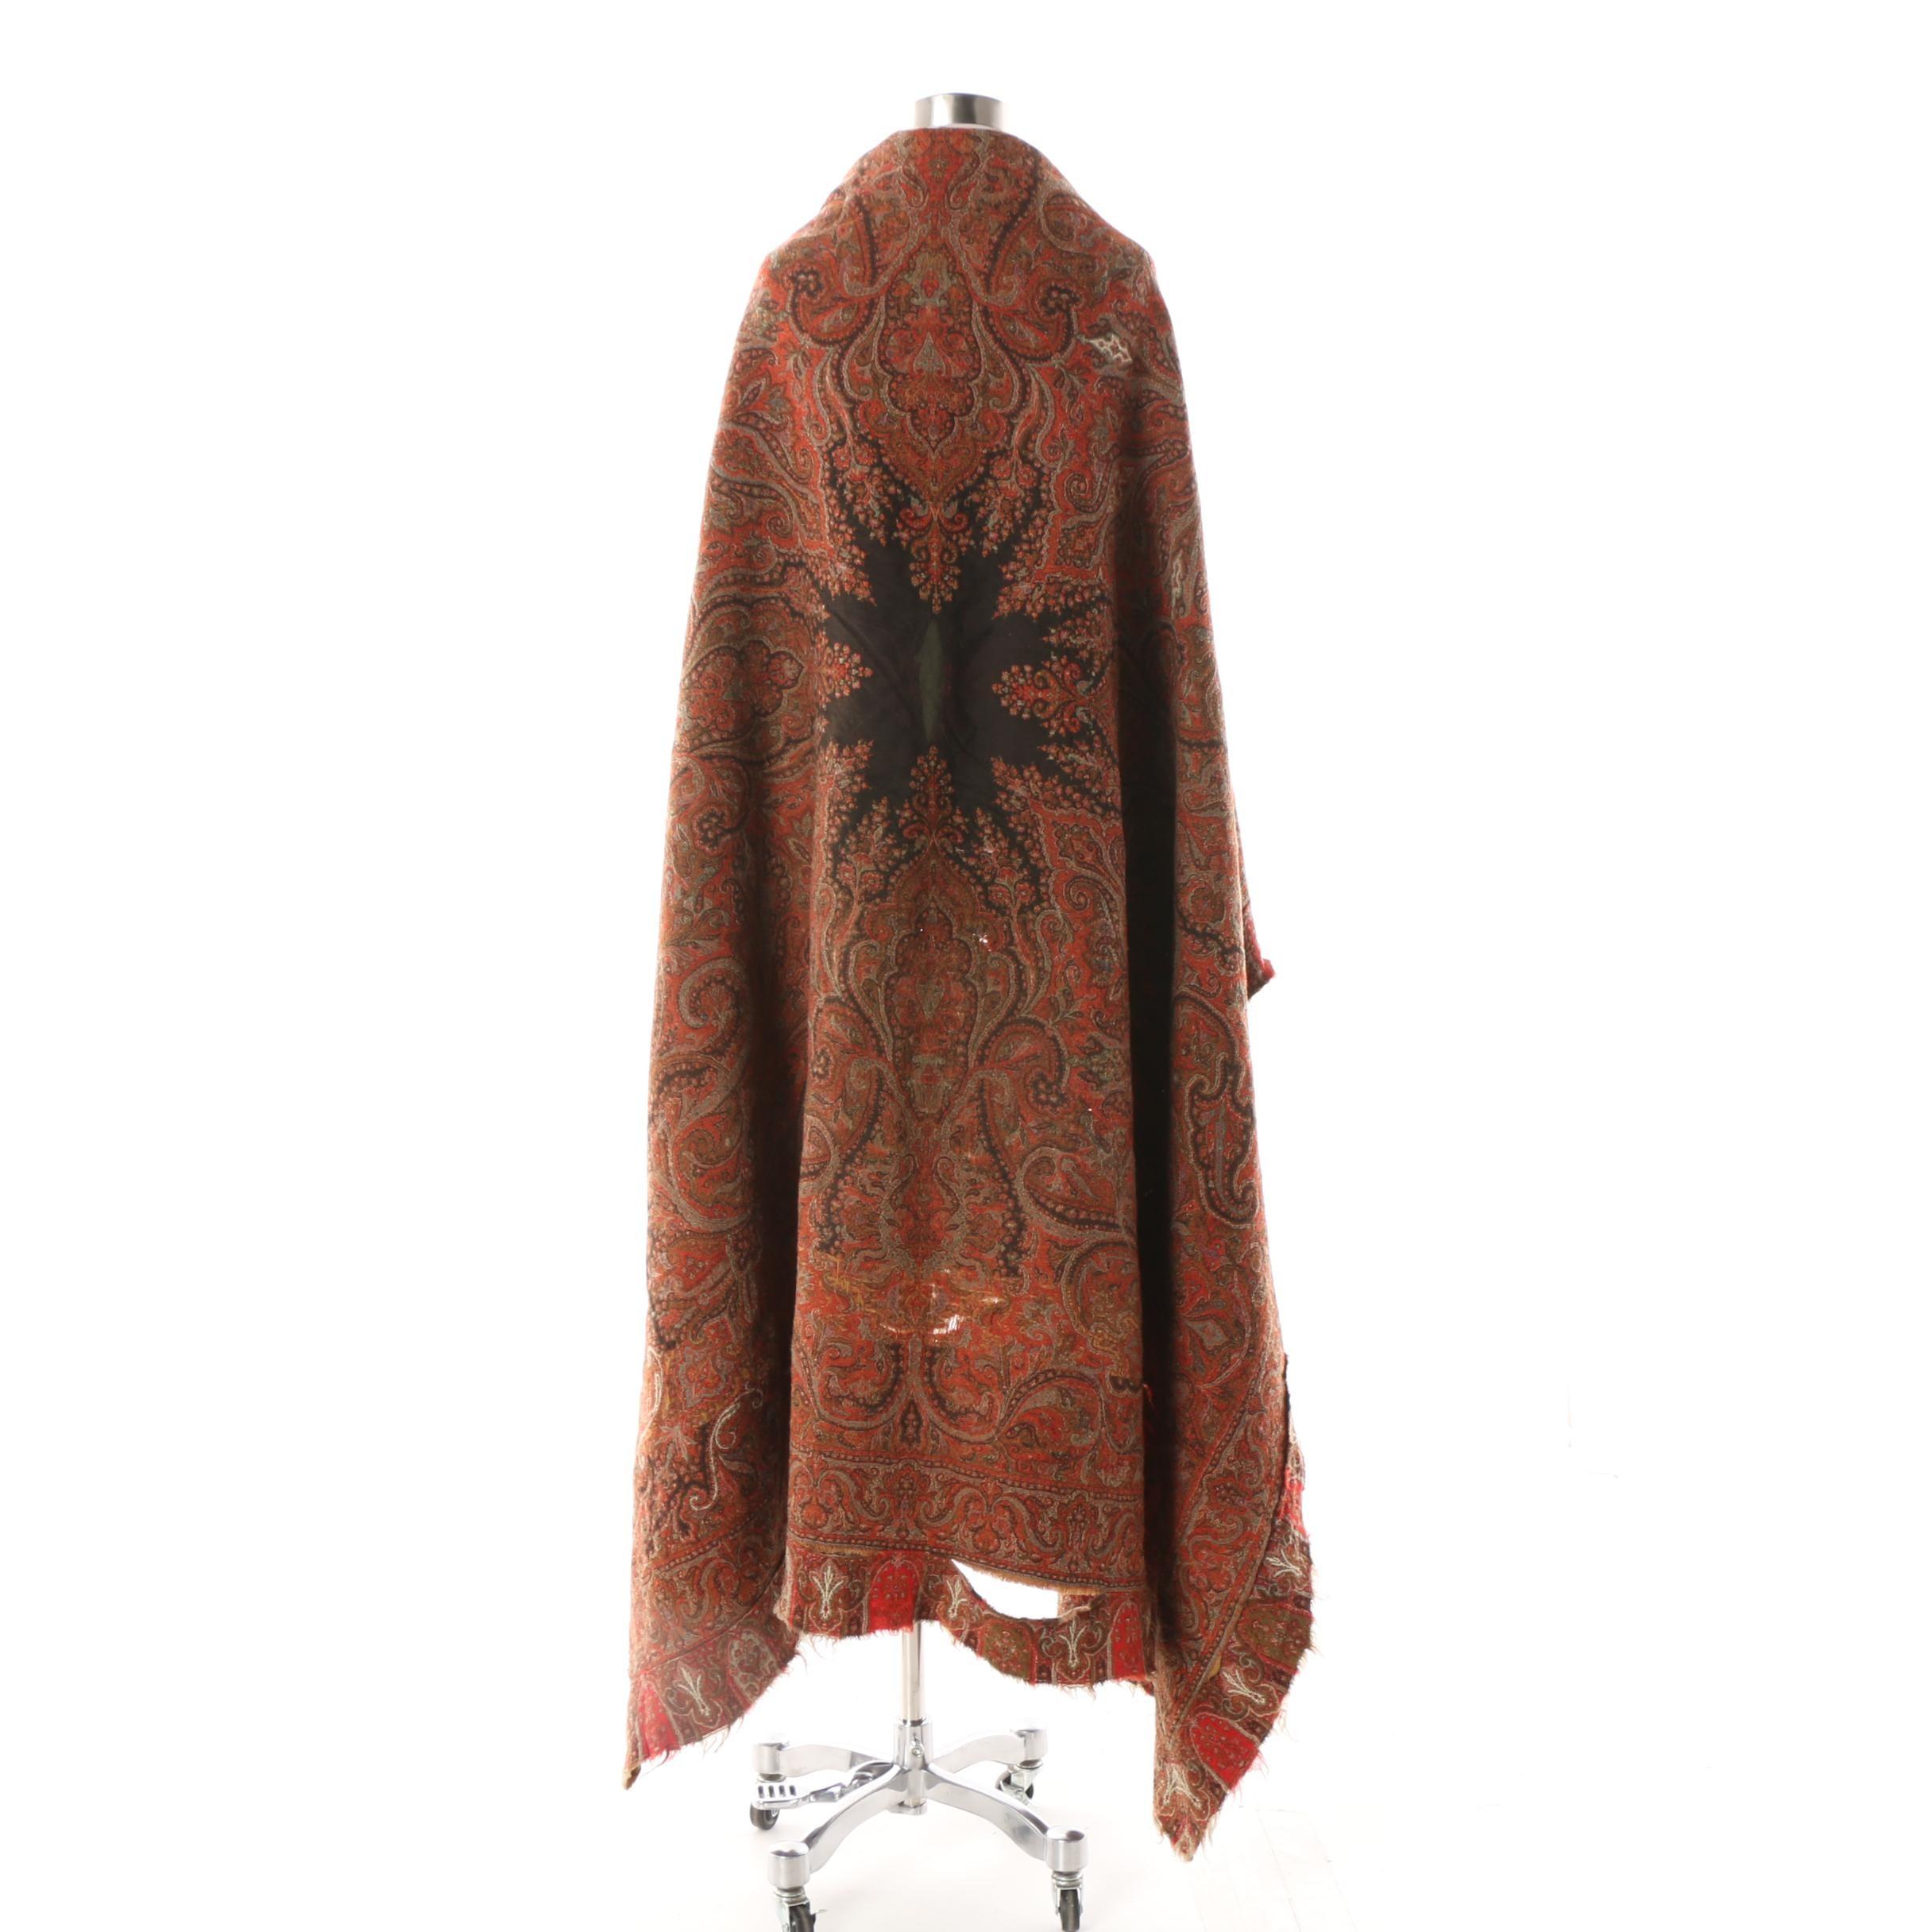 Antique Kashmiri Paisley Pashmina Wool Shawl